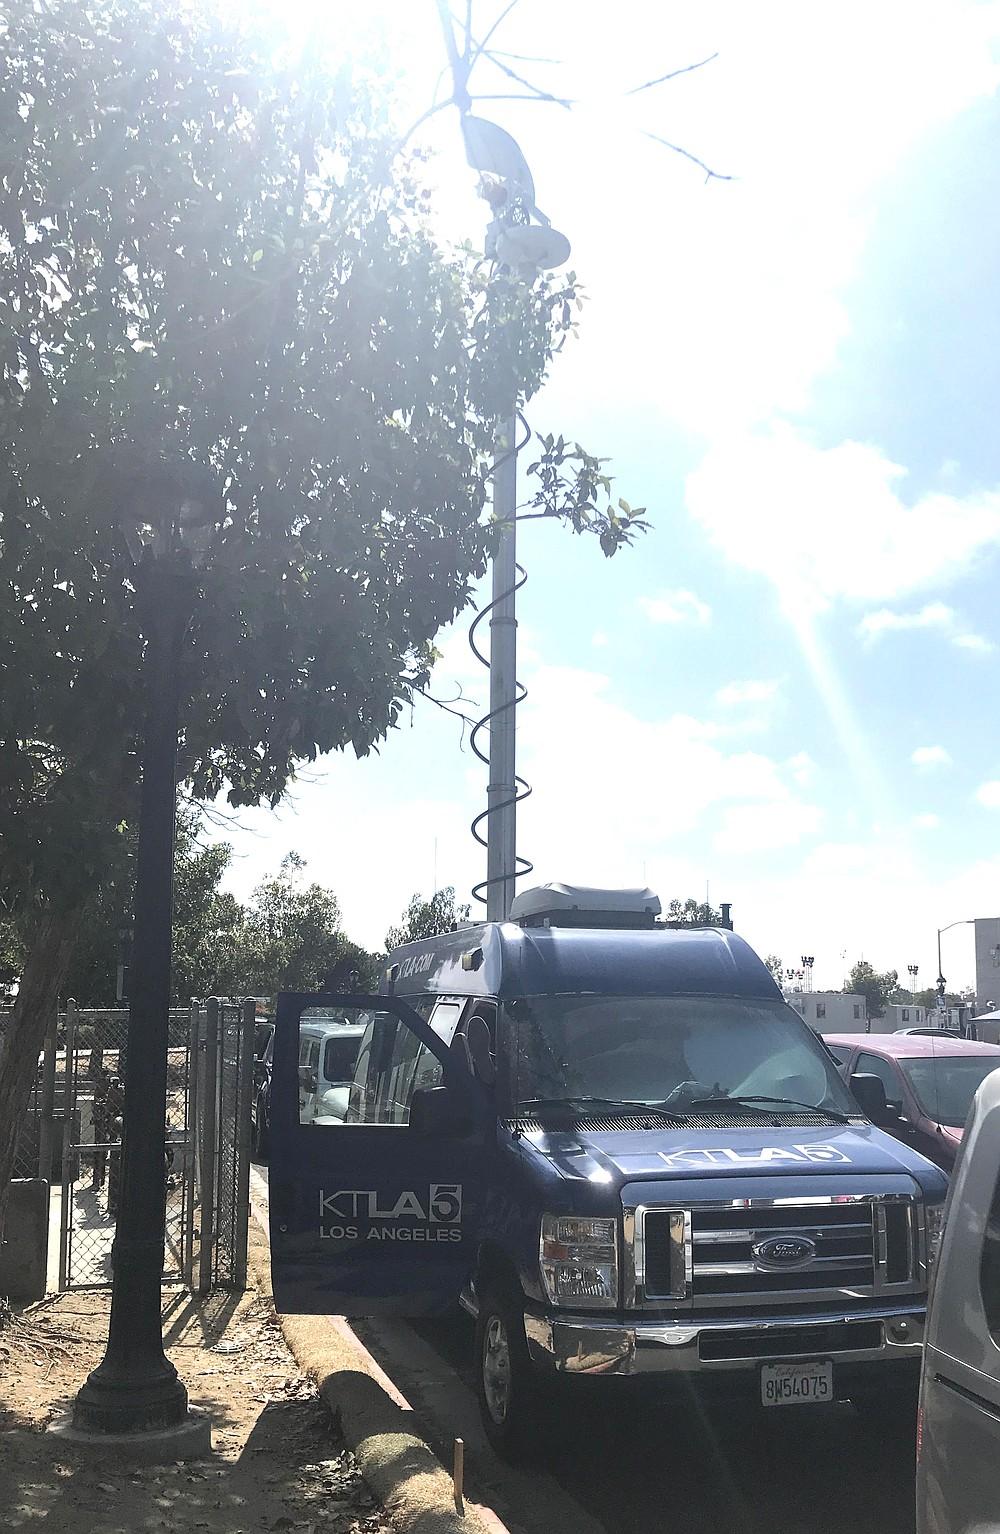 KTLA 5 news van parked on Park Boulevard by a red curb